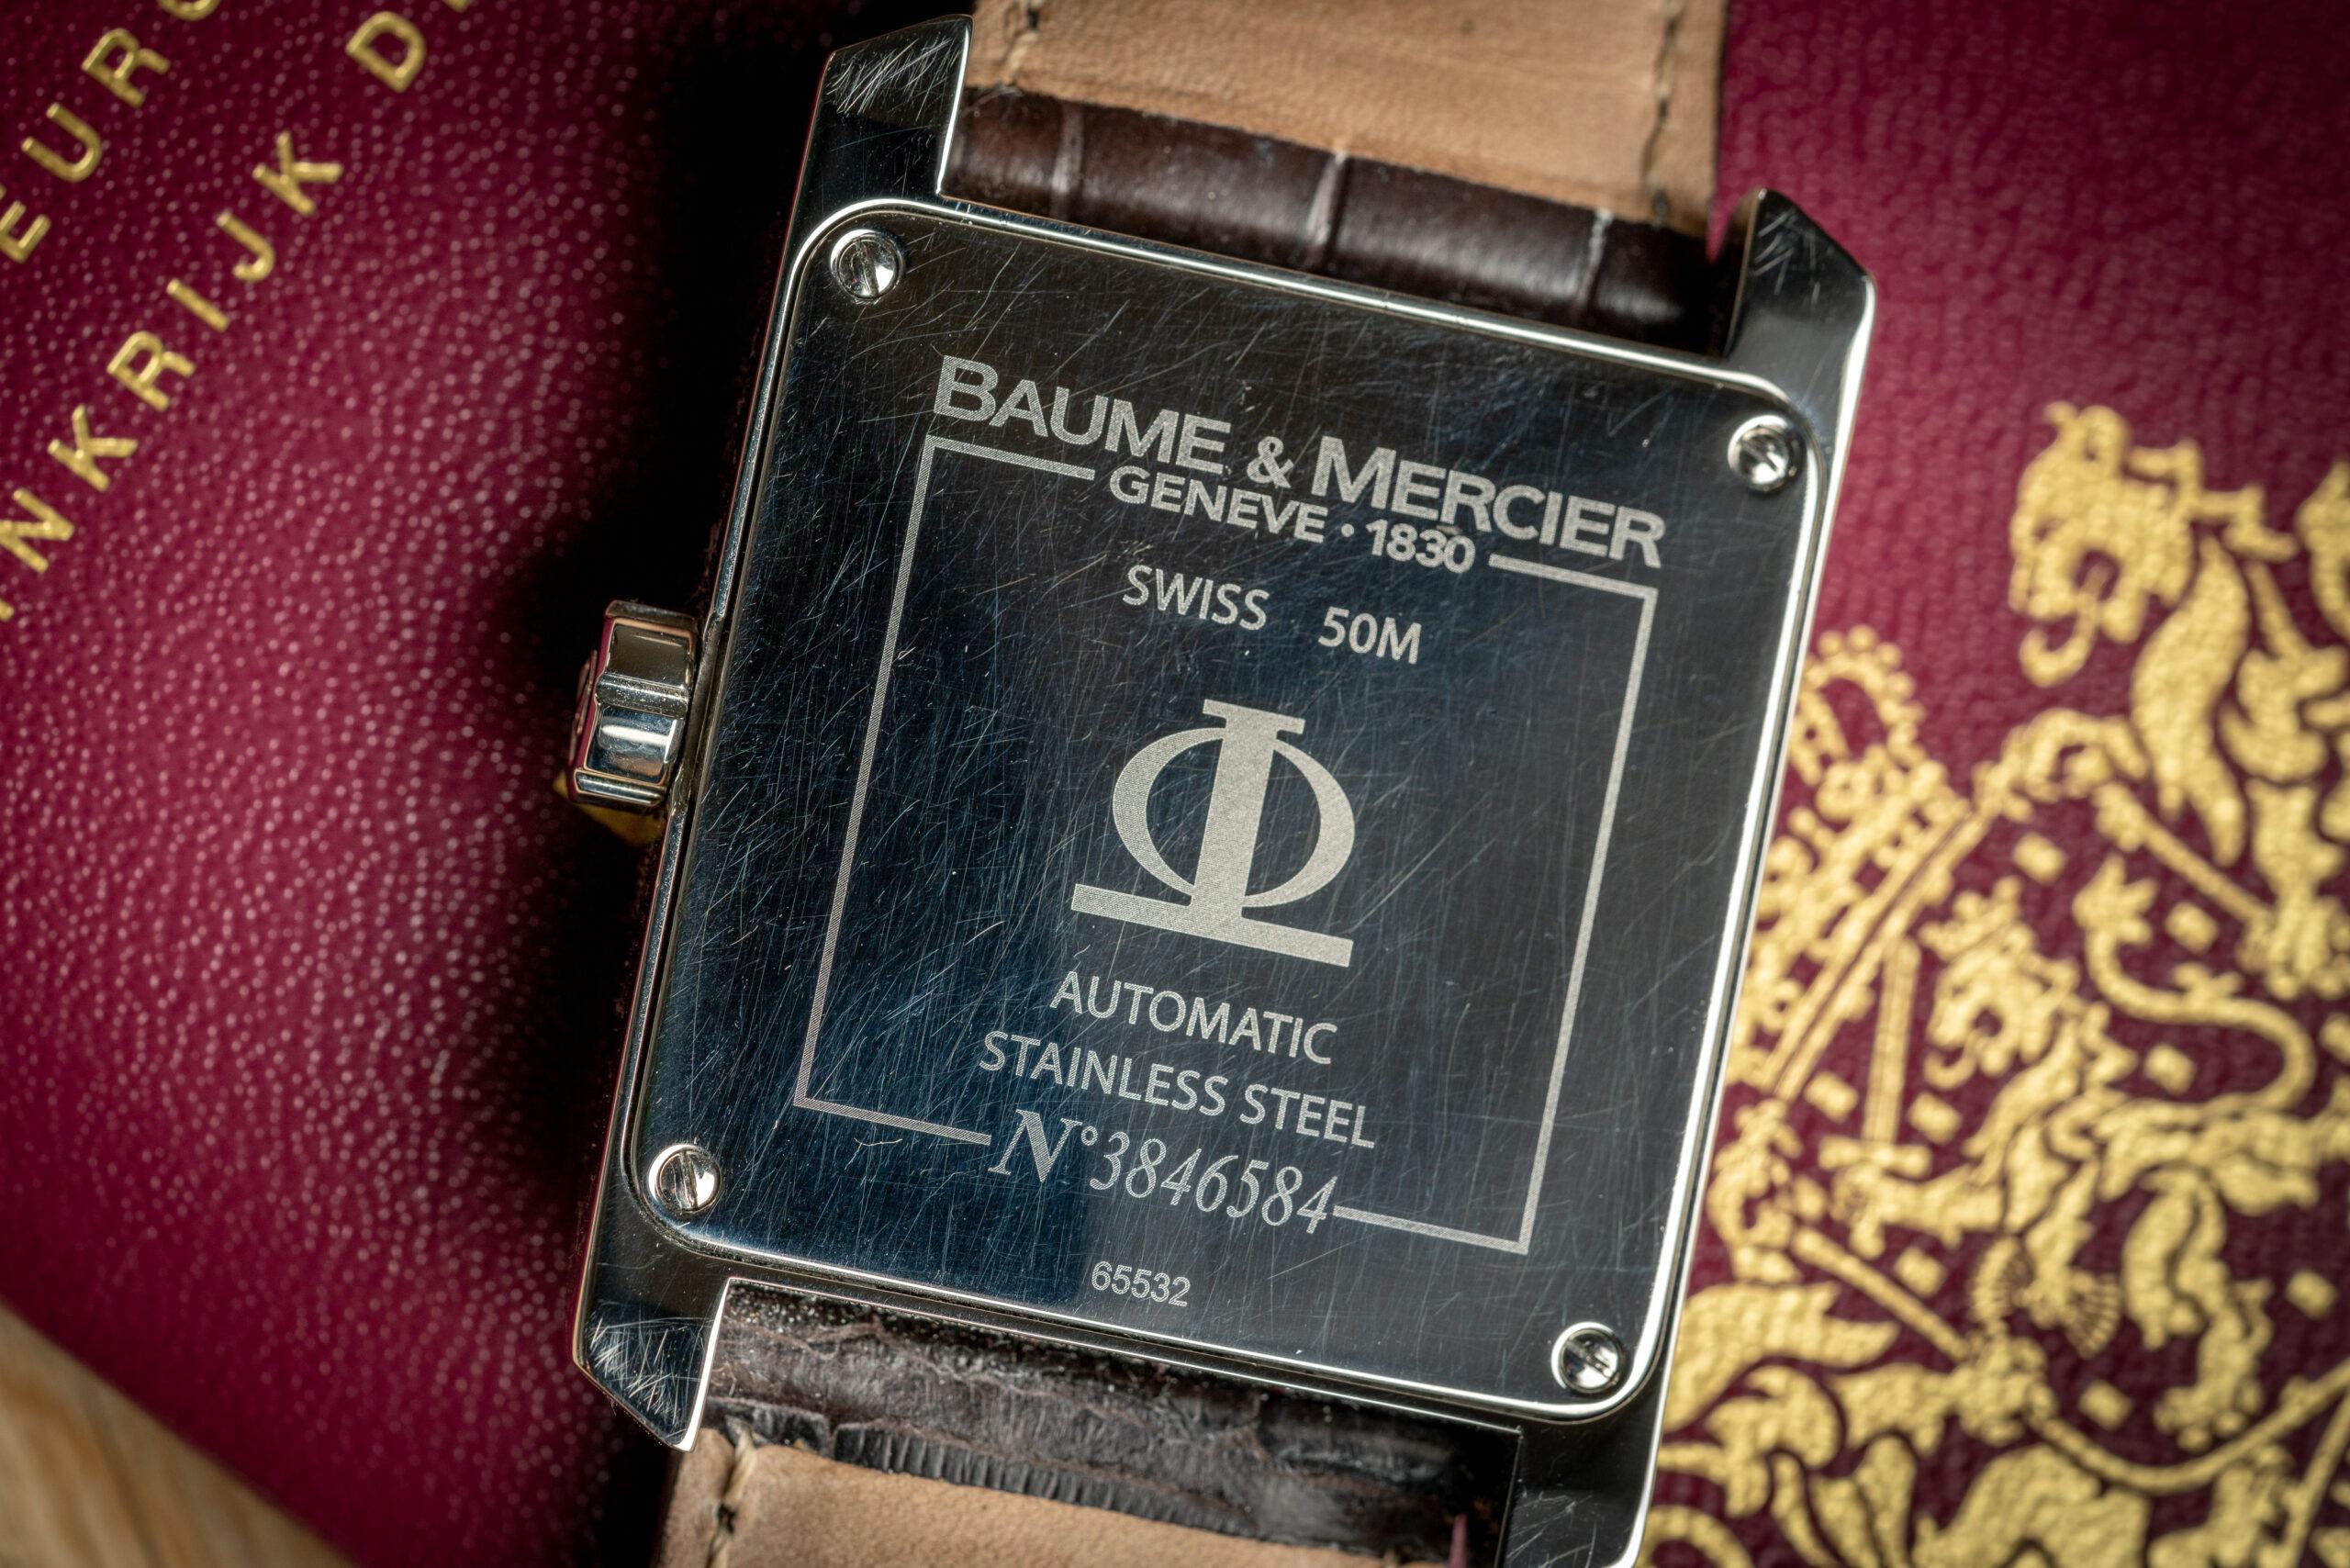 Baume et mercier hampton xl 65532 watch caseback